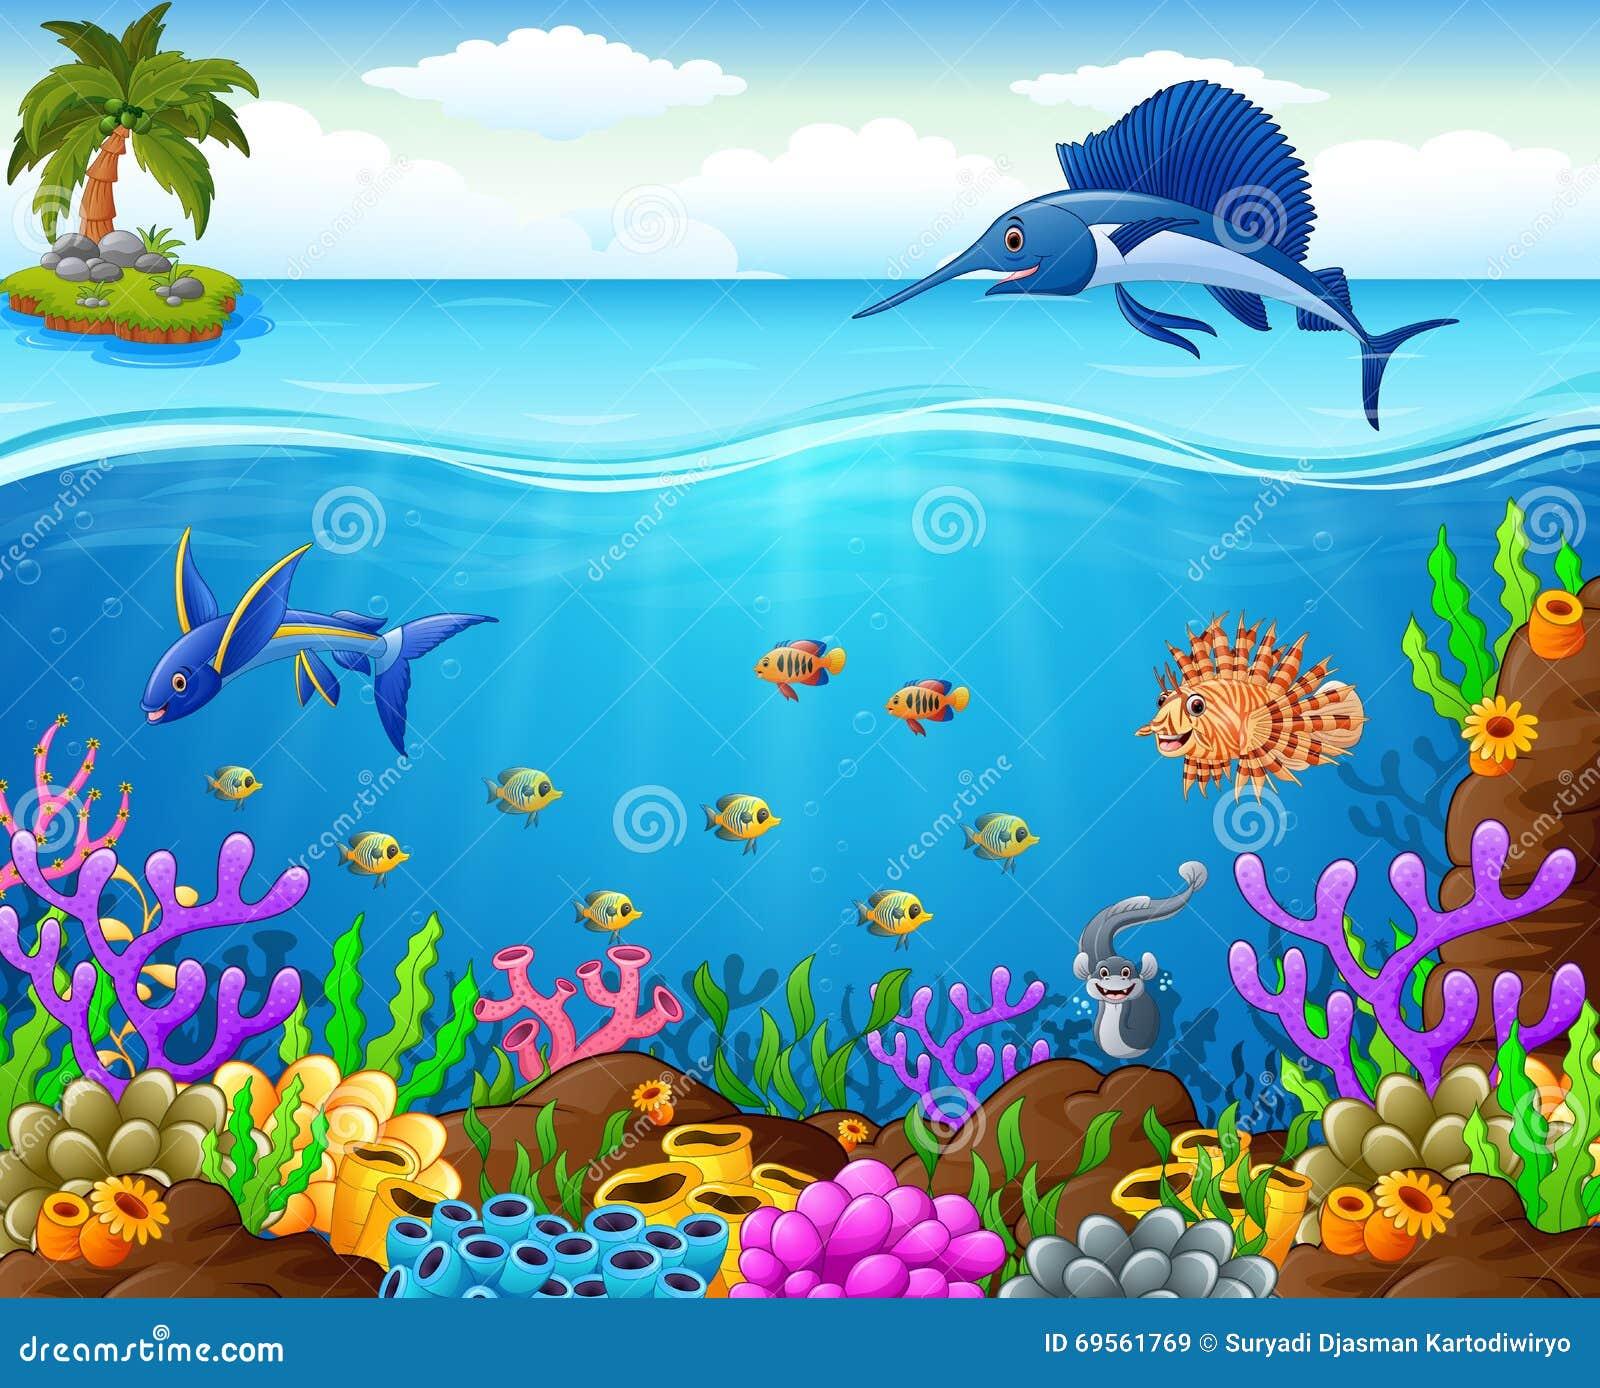 Stock Illustration Cartoon Fish Under Sea Illustration Image69561769